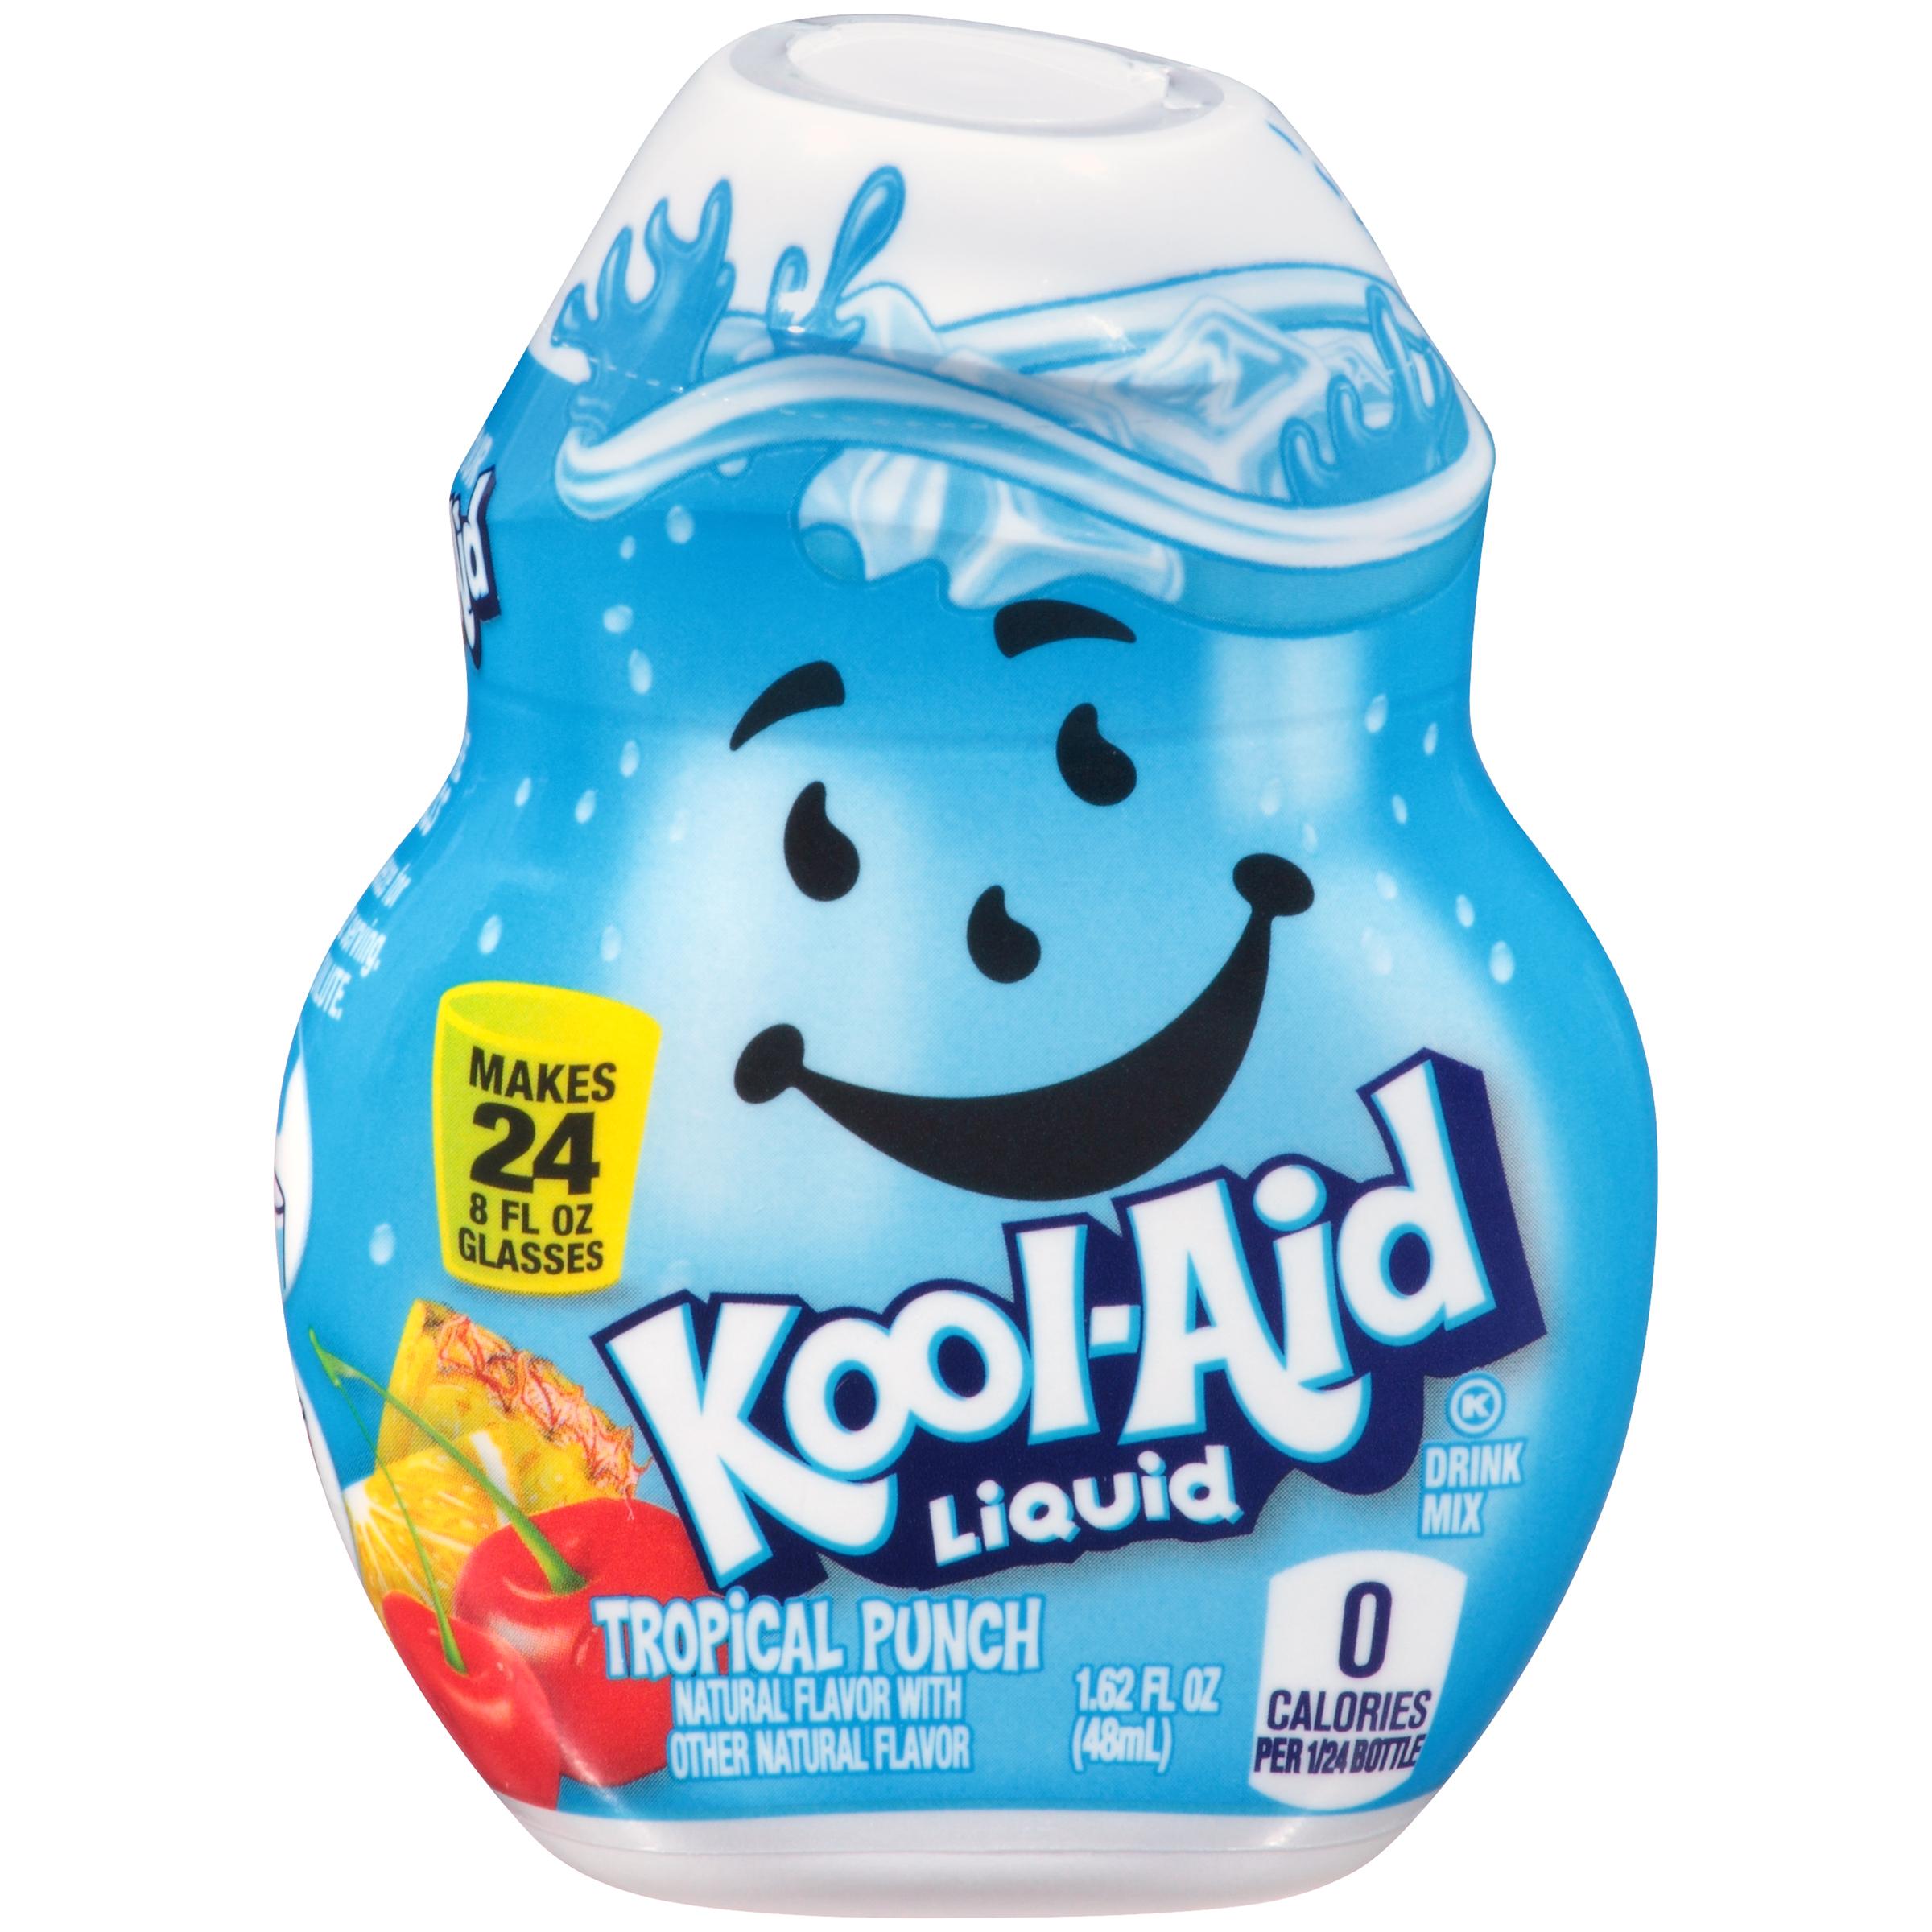 KOOL-AID Tropical Punch Liquid Drink Mix 1.62 fl oz Bottle image